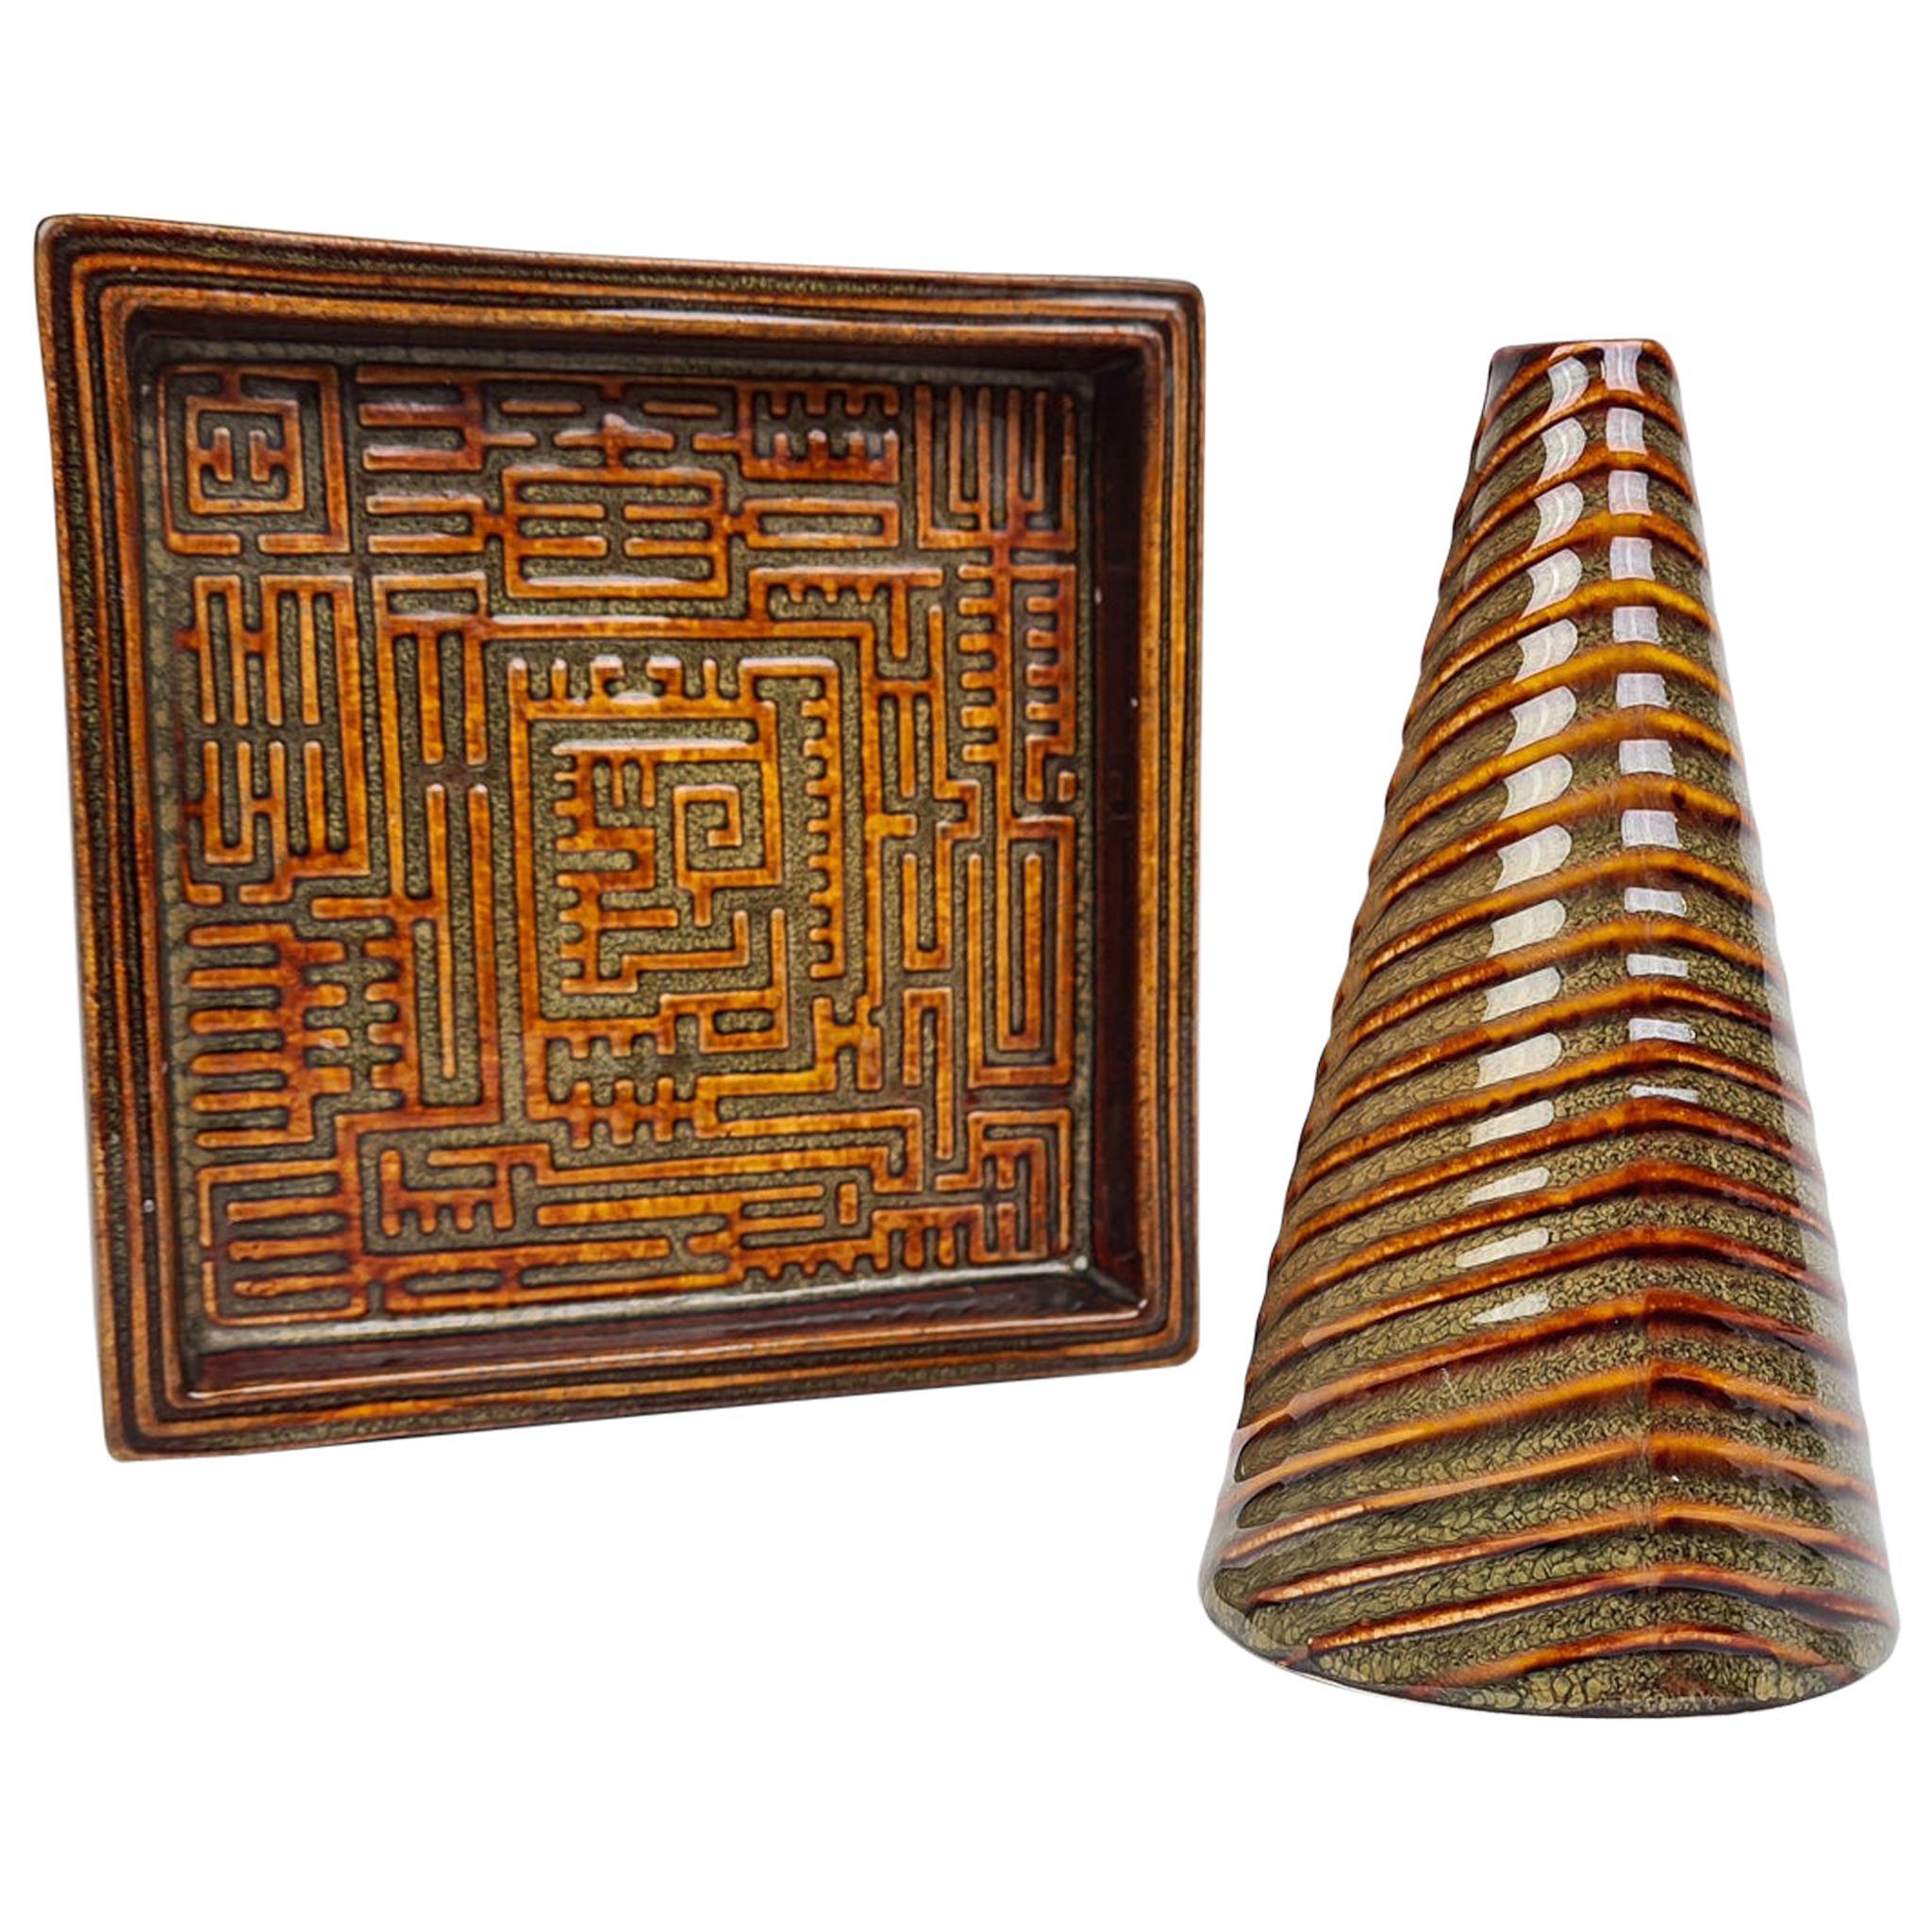 "Midcentury Vase and Bowl ""Domino"" Stig Lindberg, Gustavsberg, Sweden"